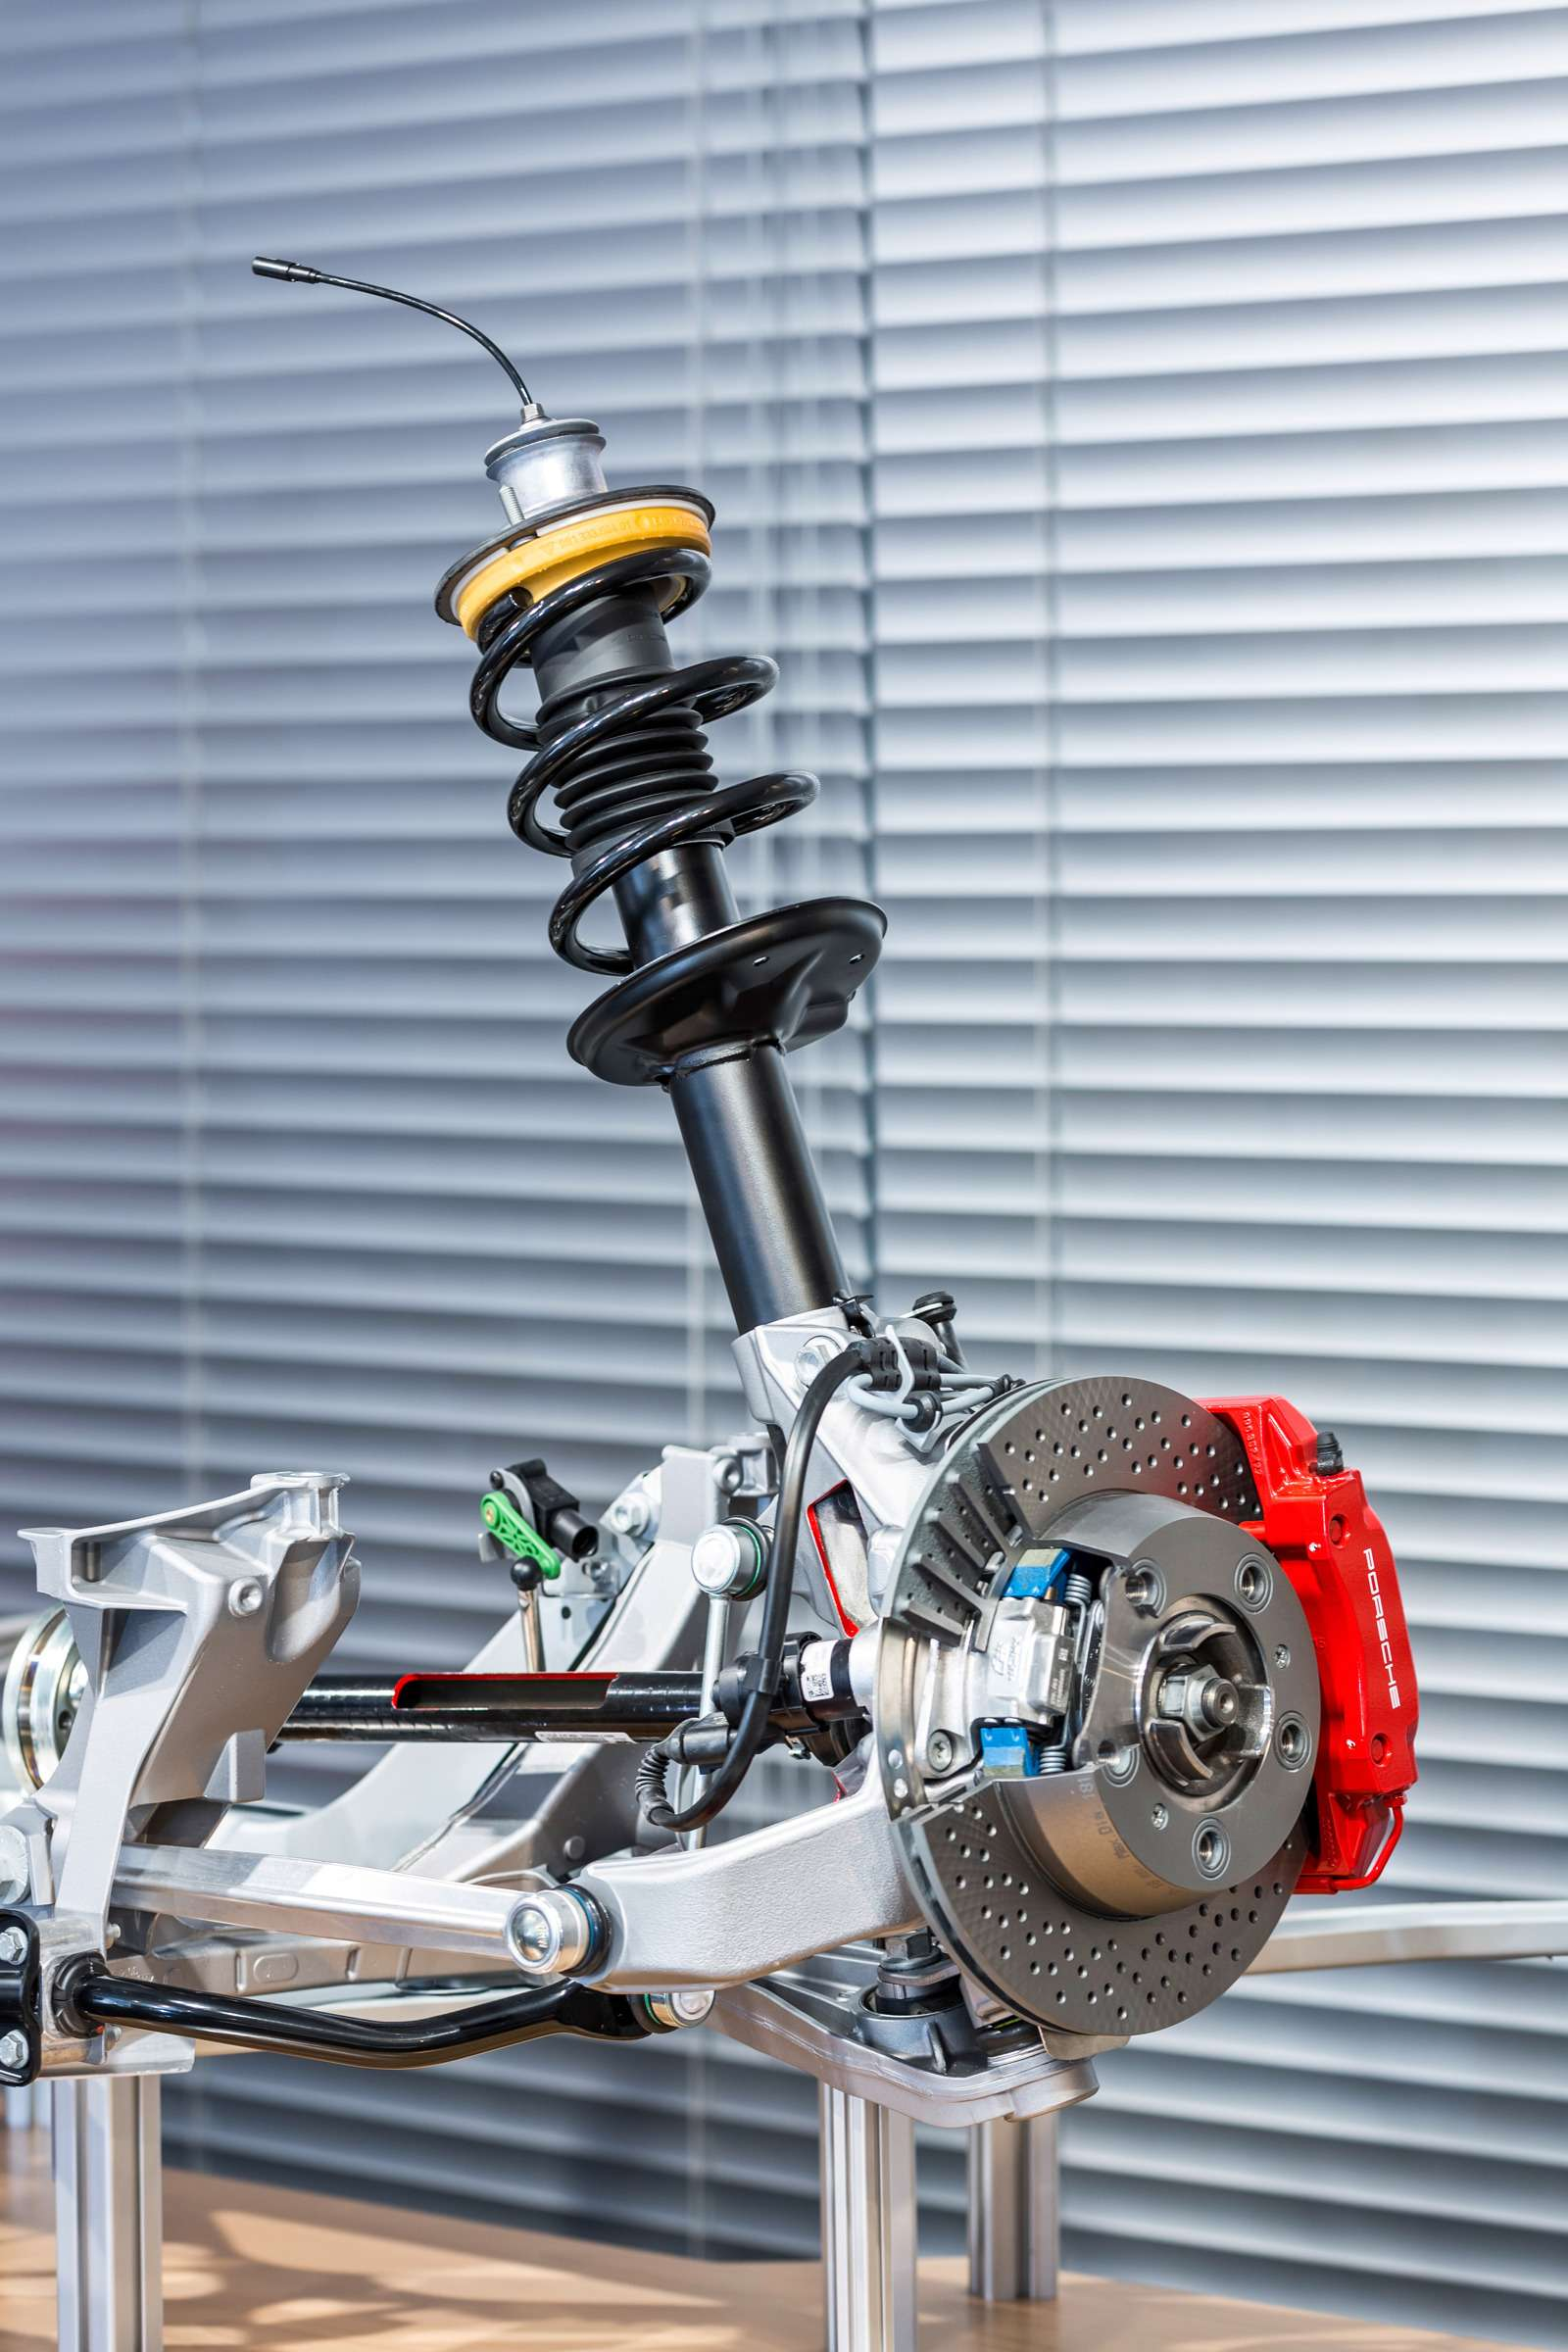 Изучаем новый Porsche 718 Boxster: сердце нараспашку— фото 574118